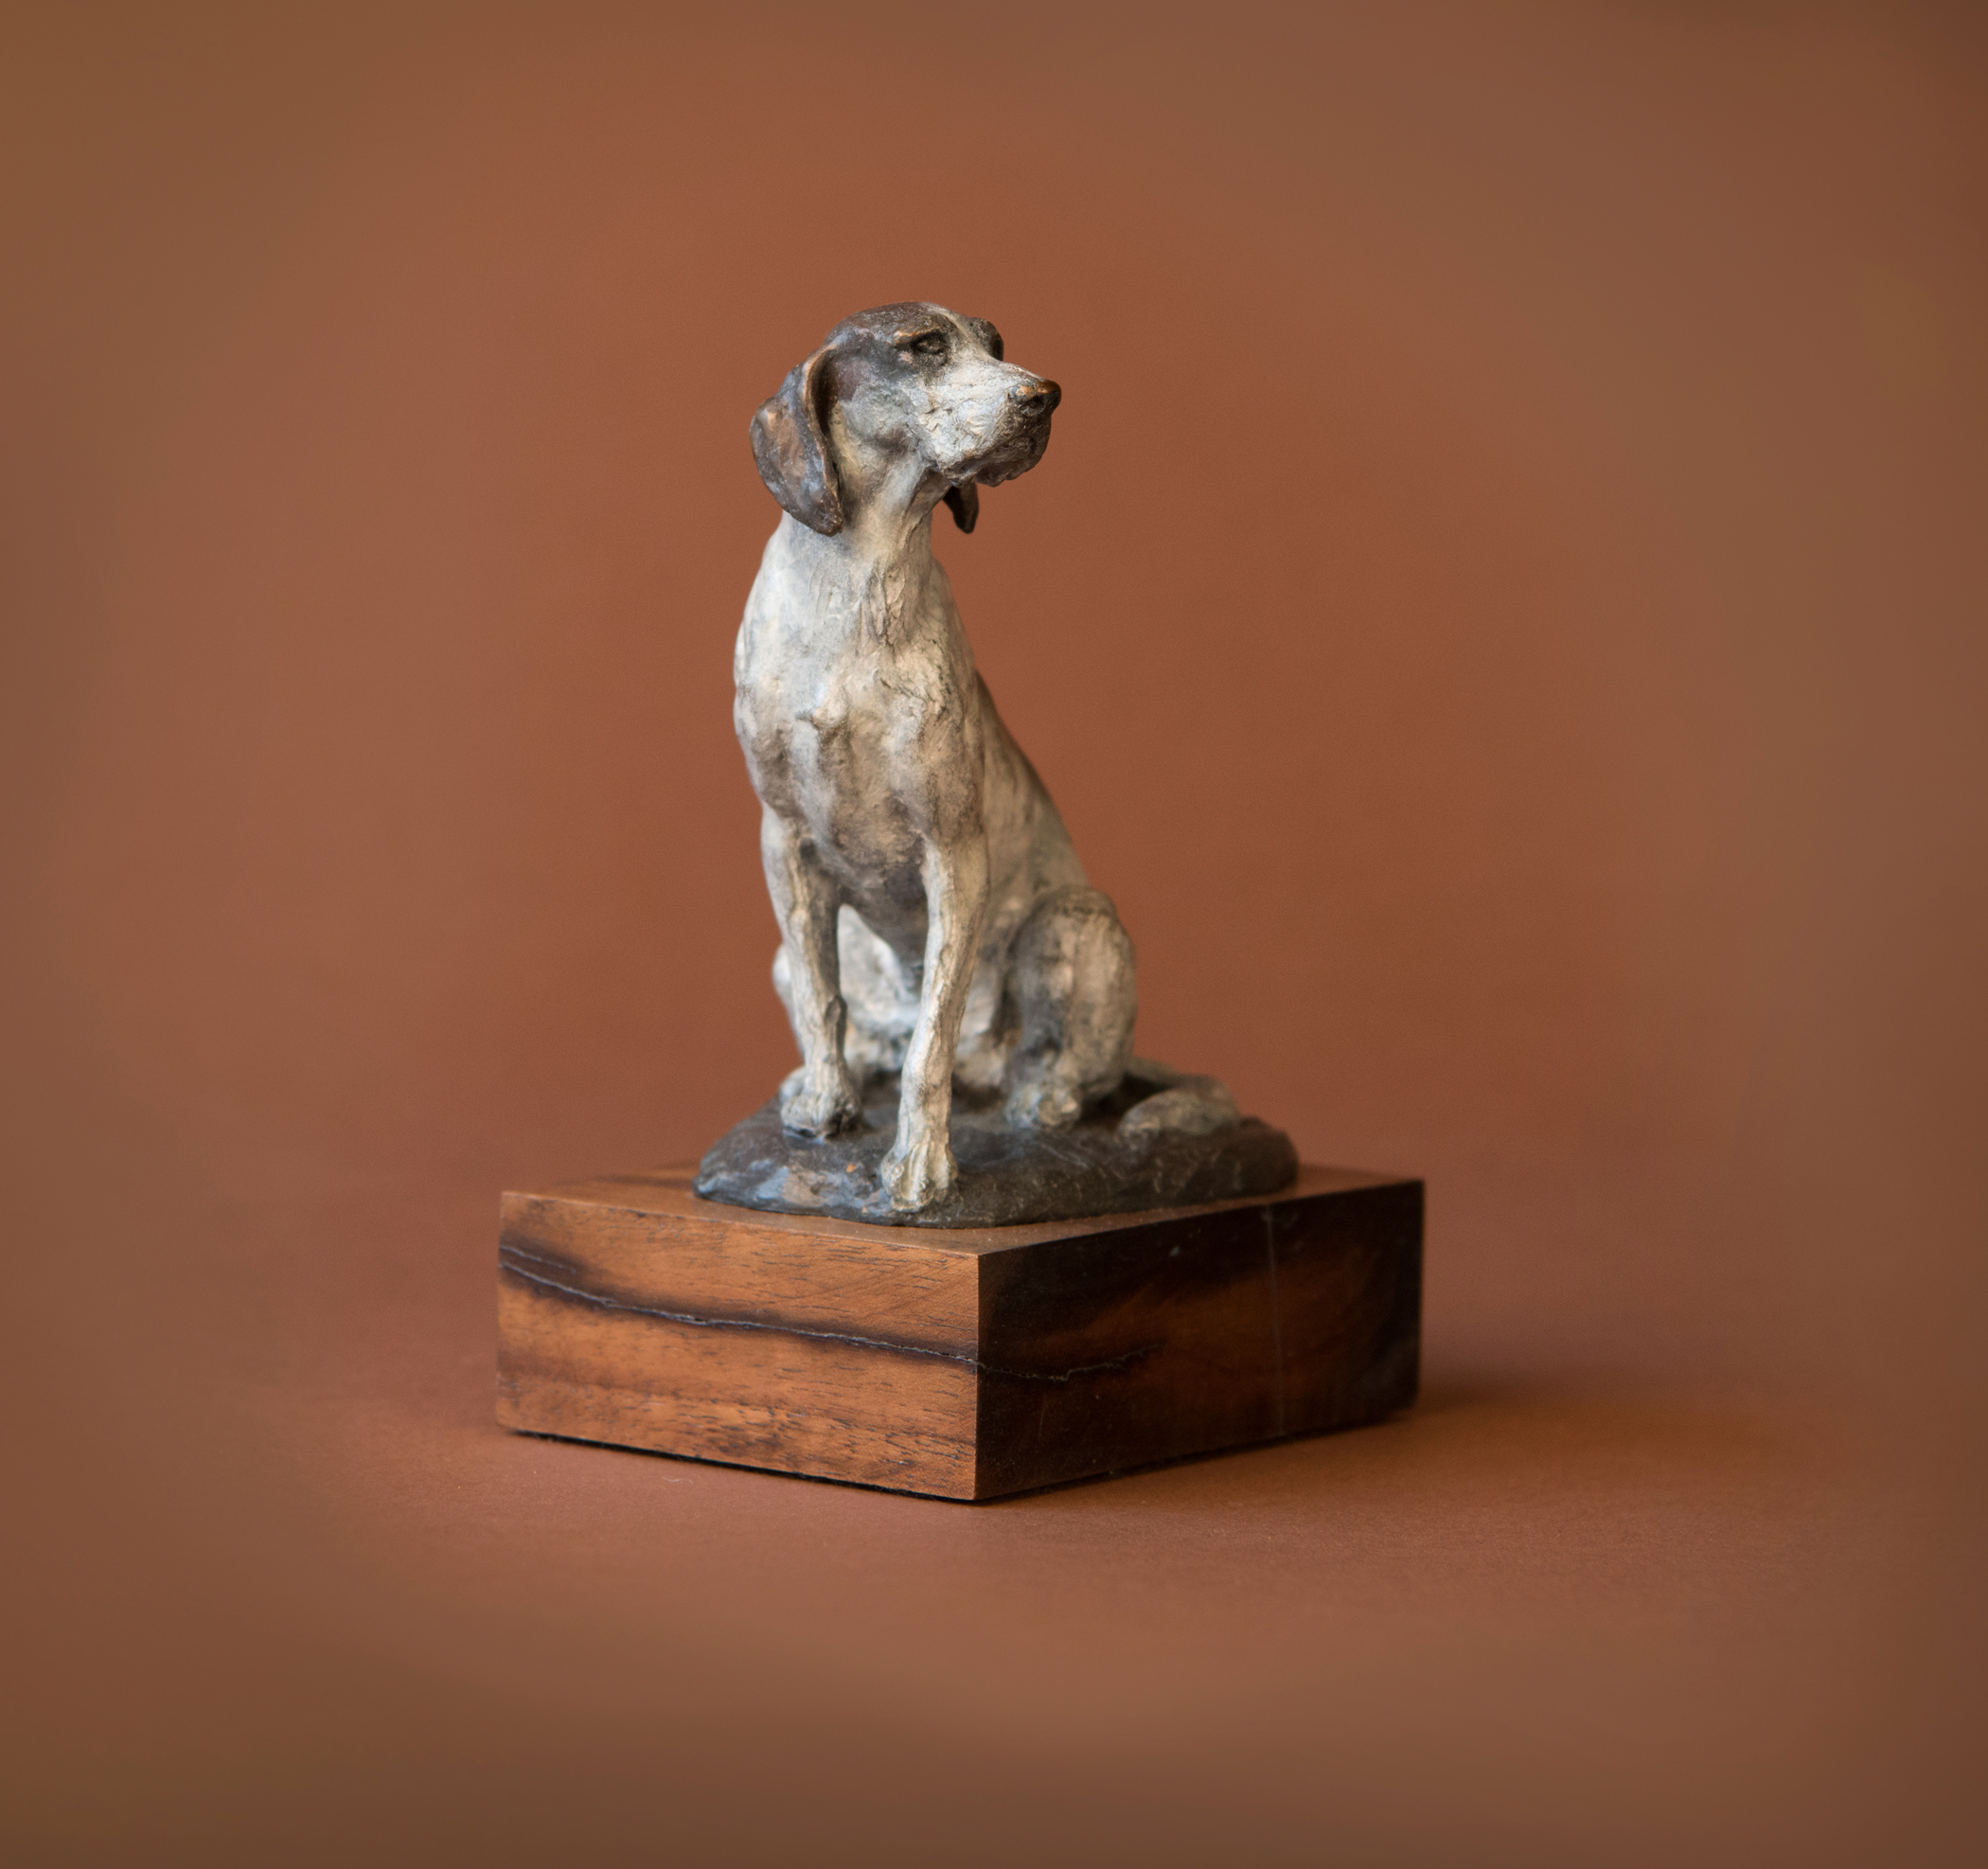 seatedhound02 copy.jpg